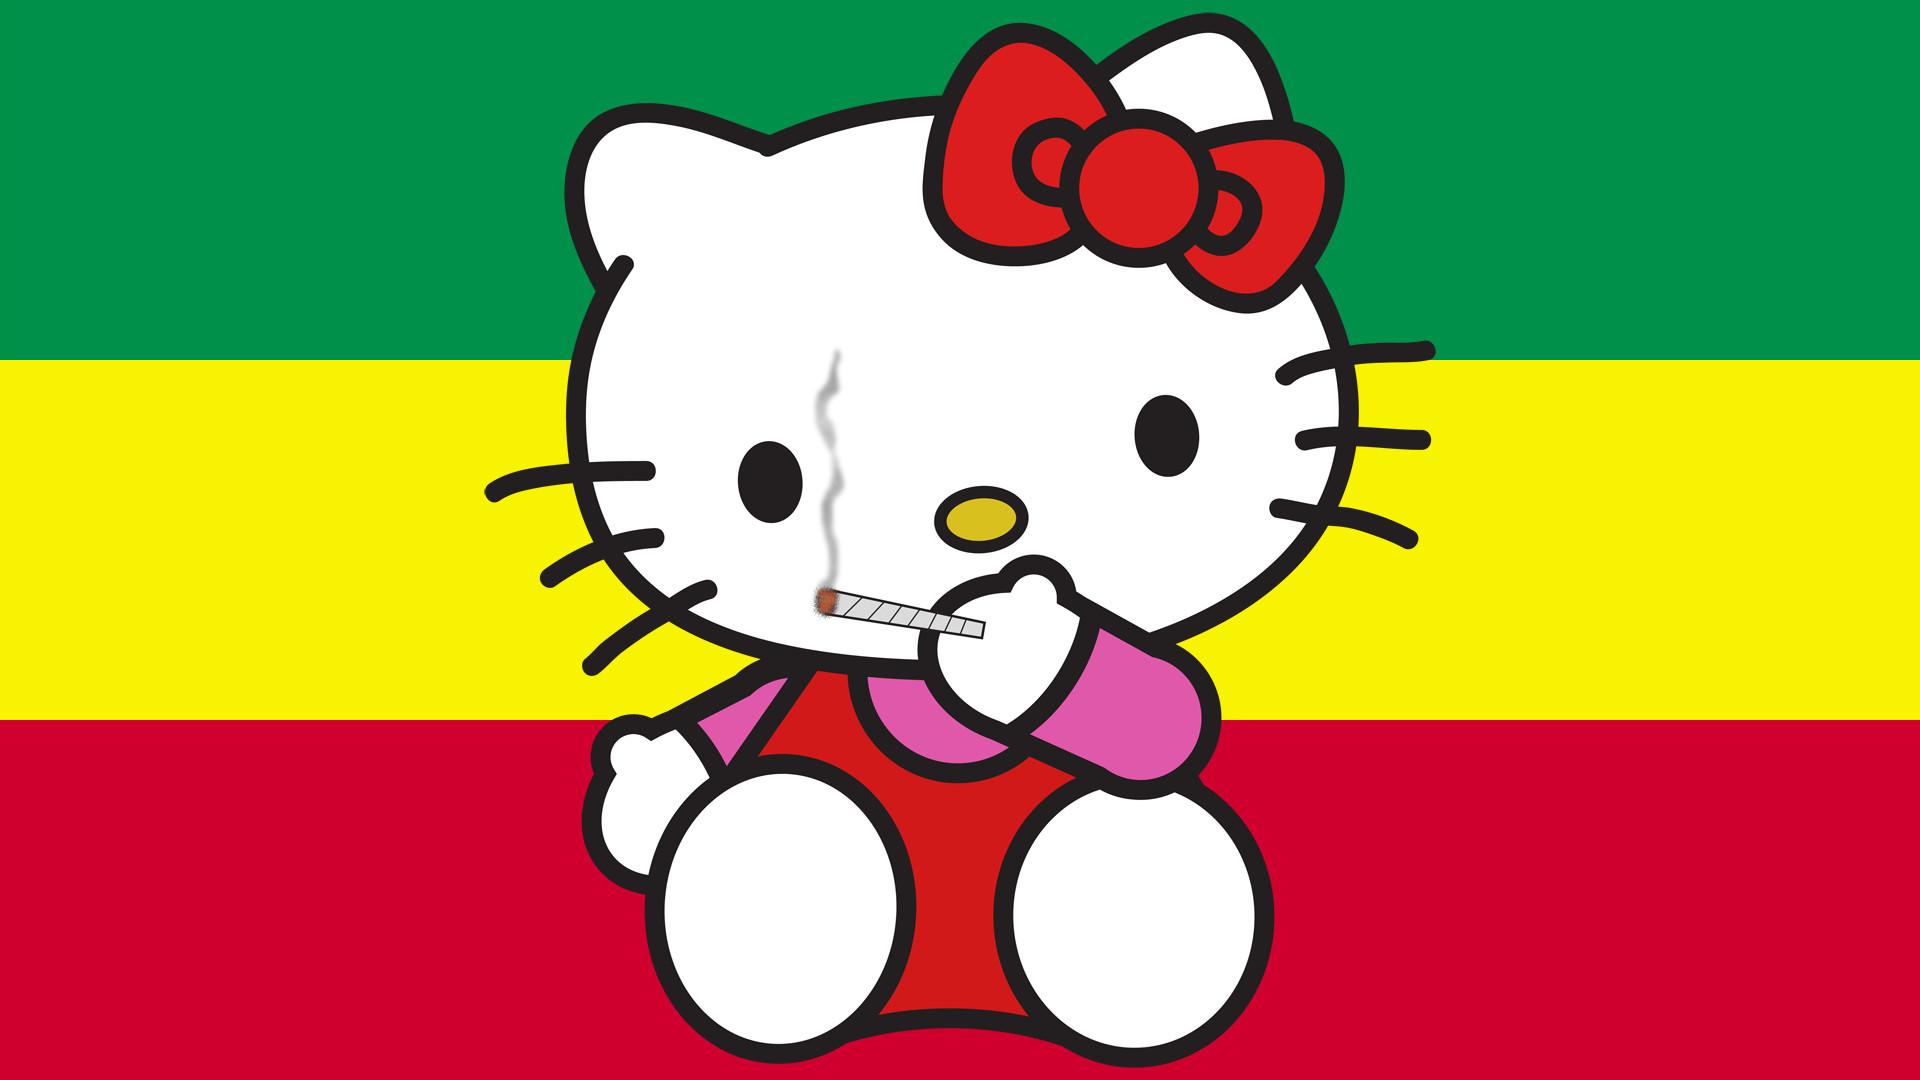 Great Wallpaper Hello Kitty Desktop Background - 724991-new-hello-kitty-wallpaper-for-pc-1920x1080-for-samsung  Snapshot_347652.jpg